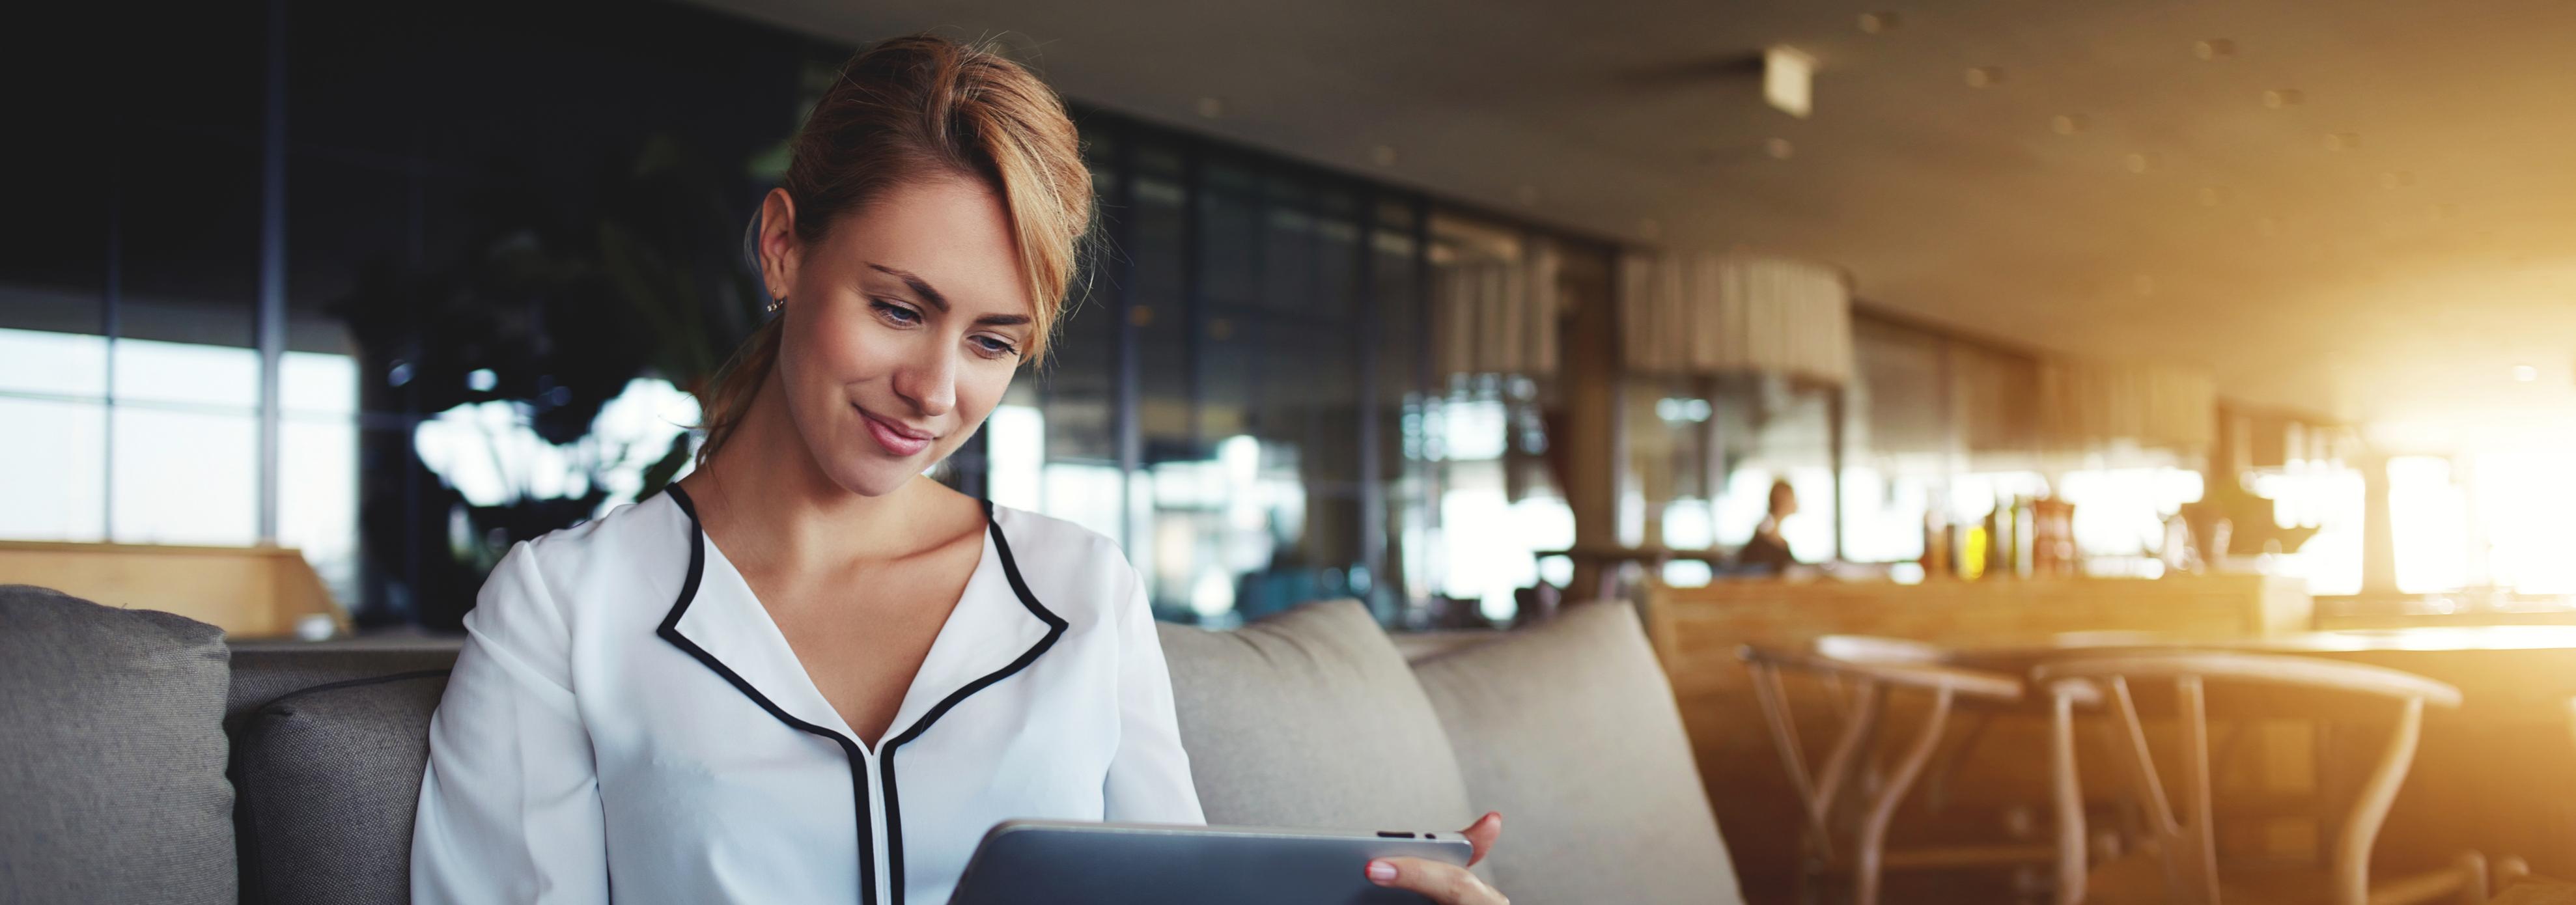 blonde woman on tablet investor relations websites